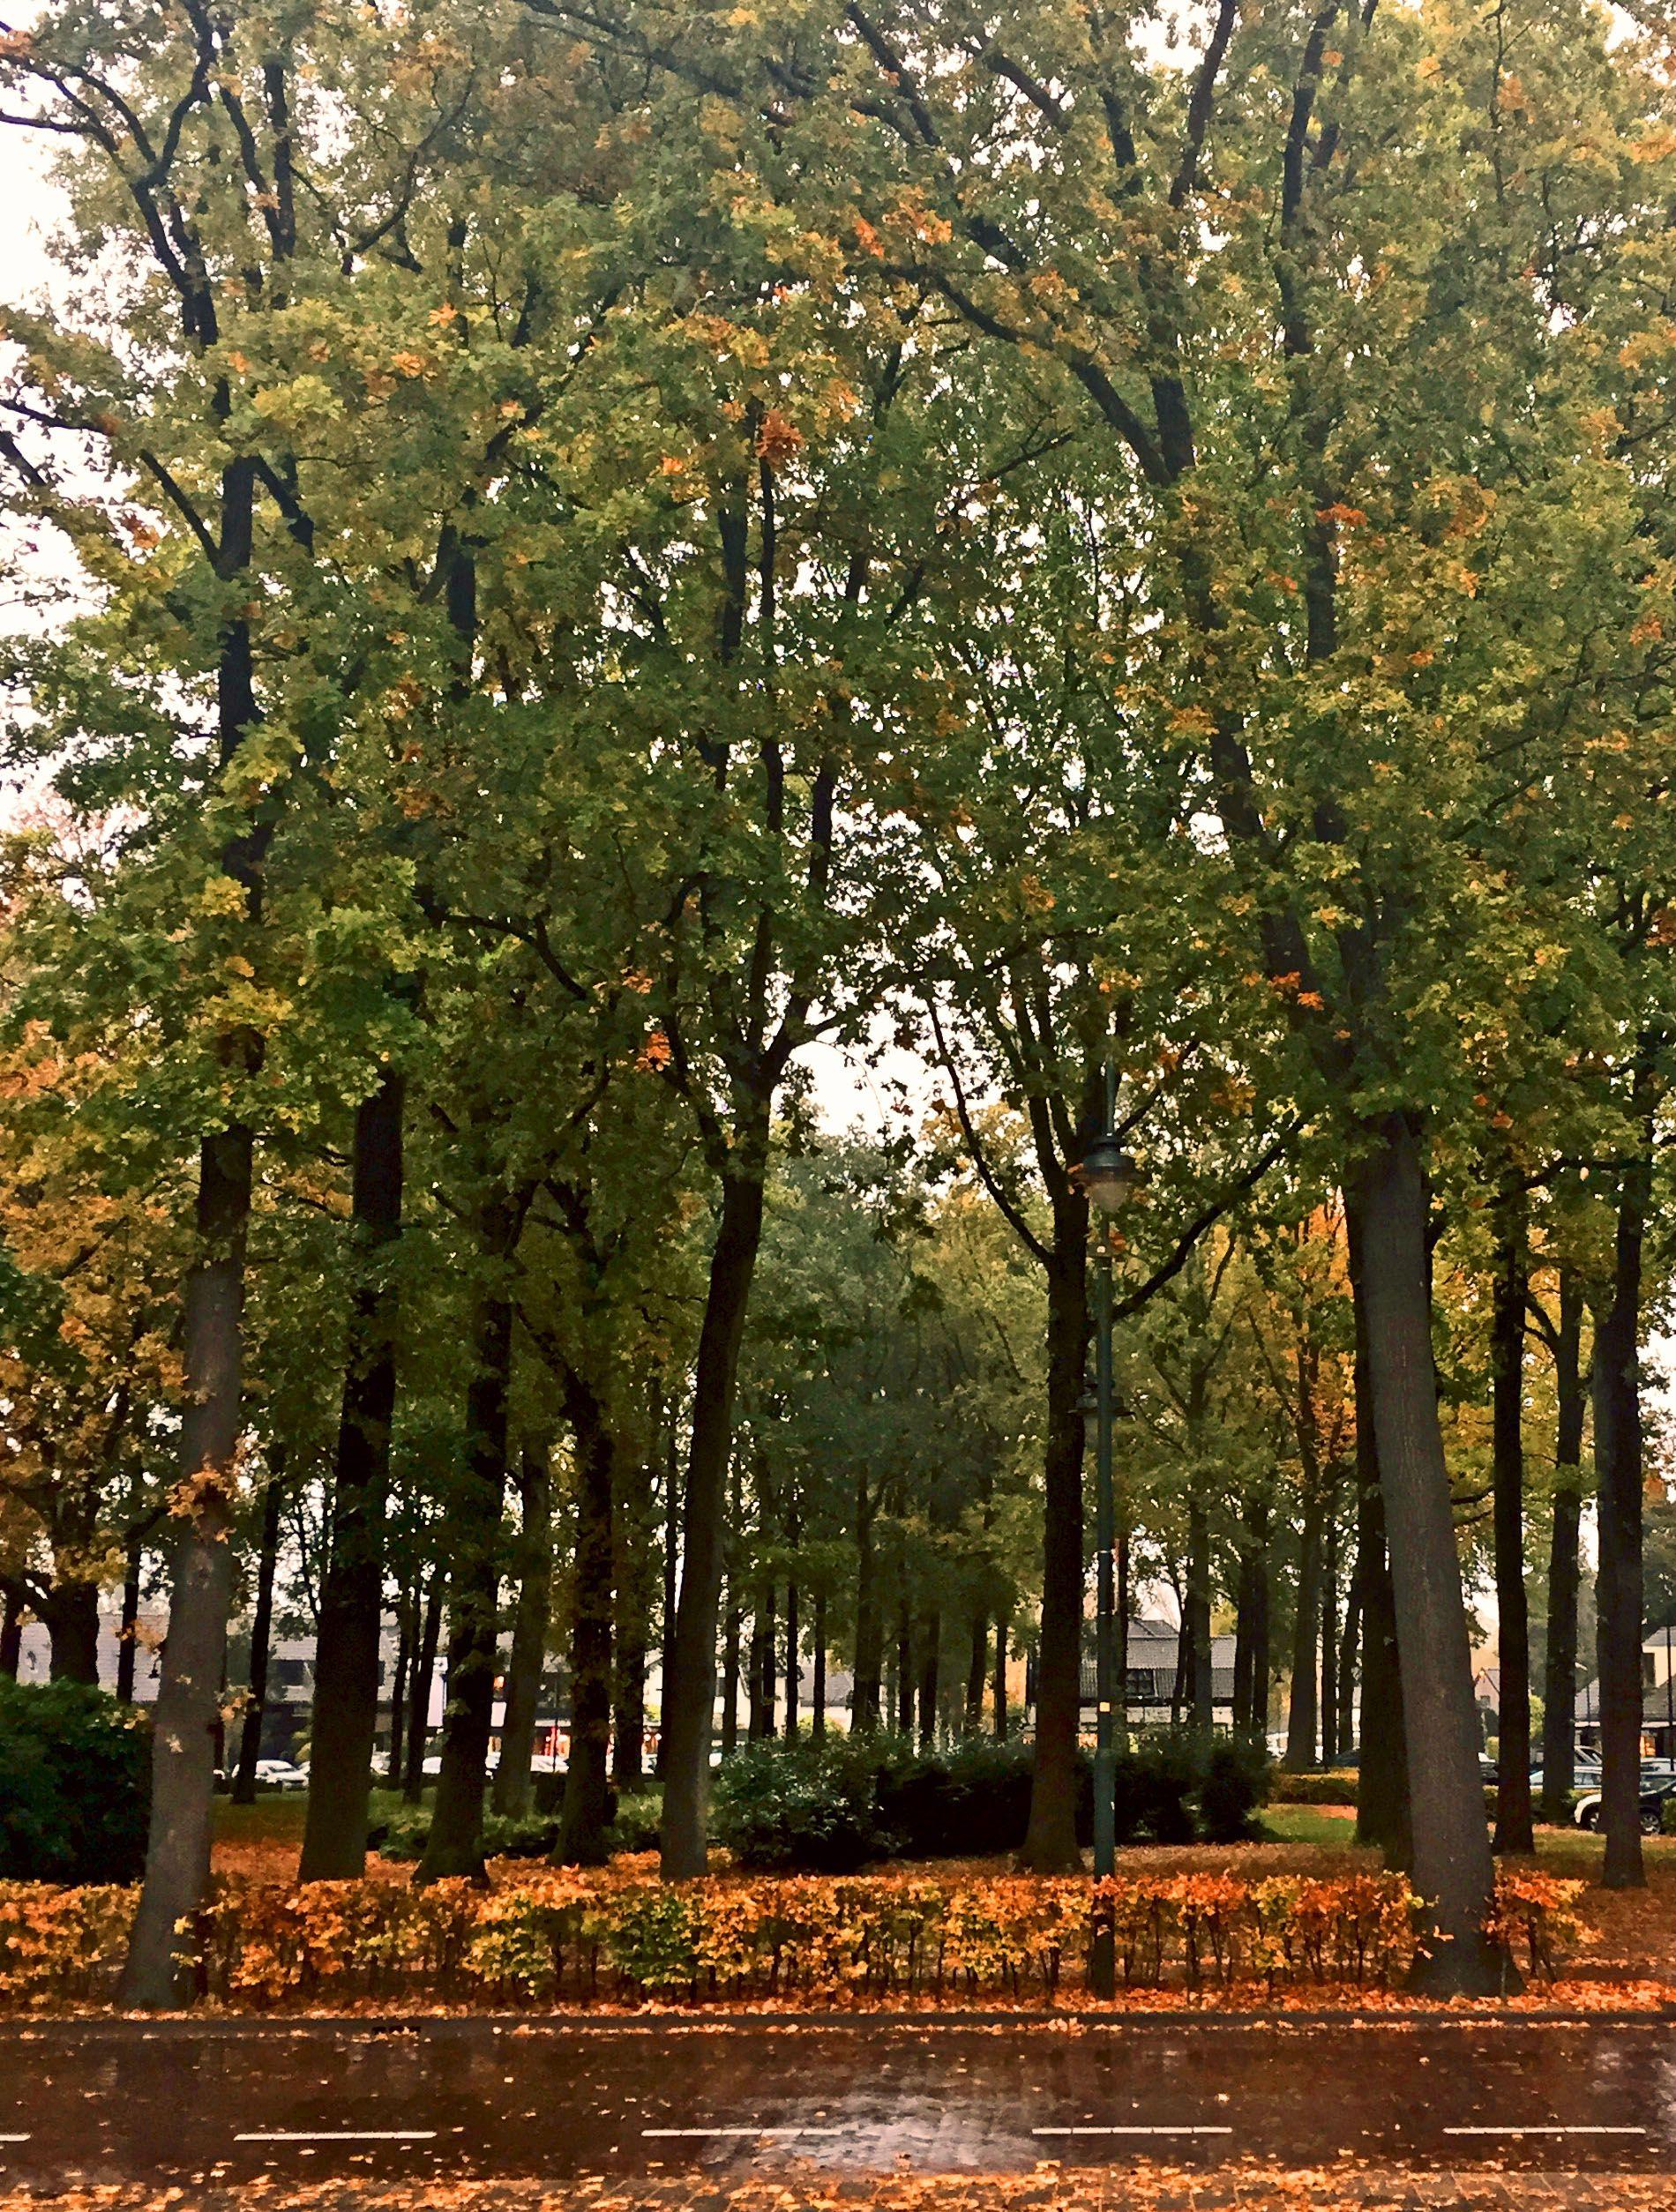 Even rainy autumn days can be beautiful.  #matsenmerthe #rain #Laren # autumn